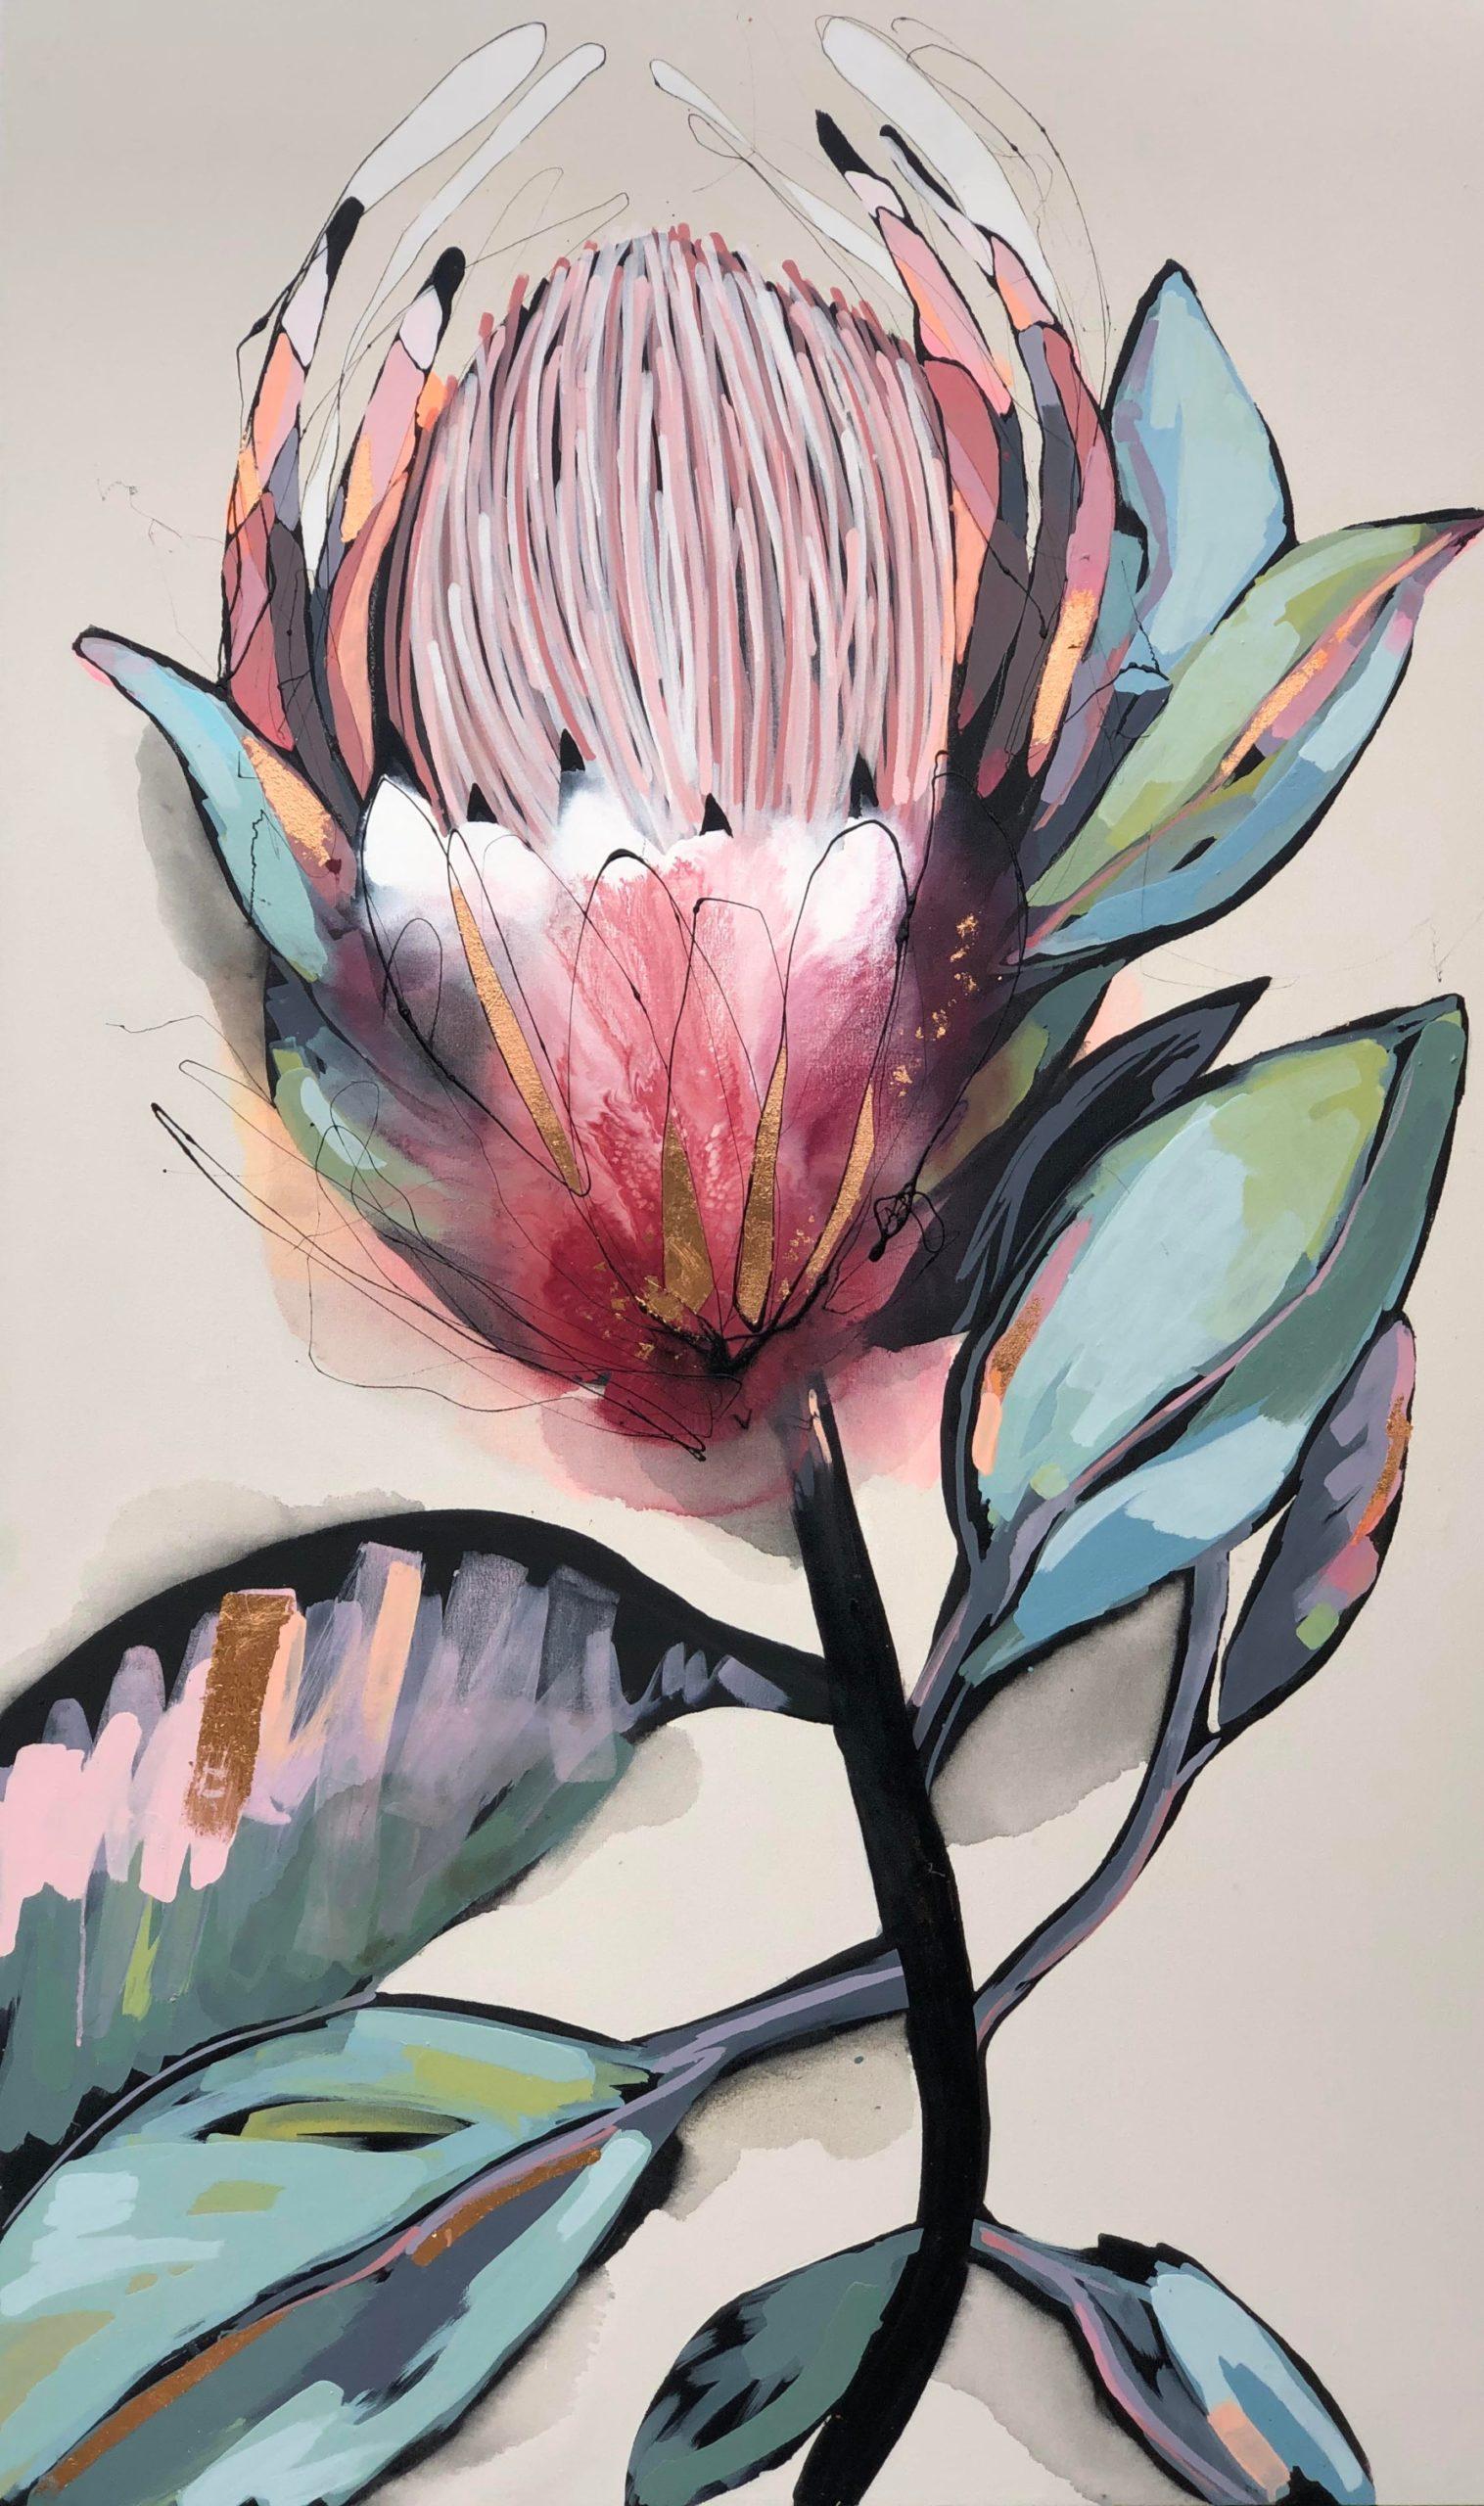 Vicky Sanders Protea Series - Anastasia's Protea